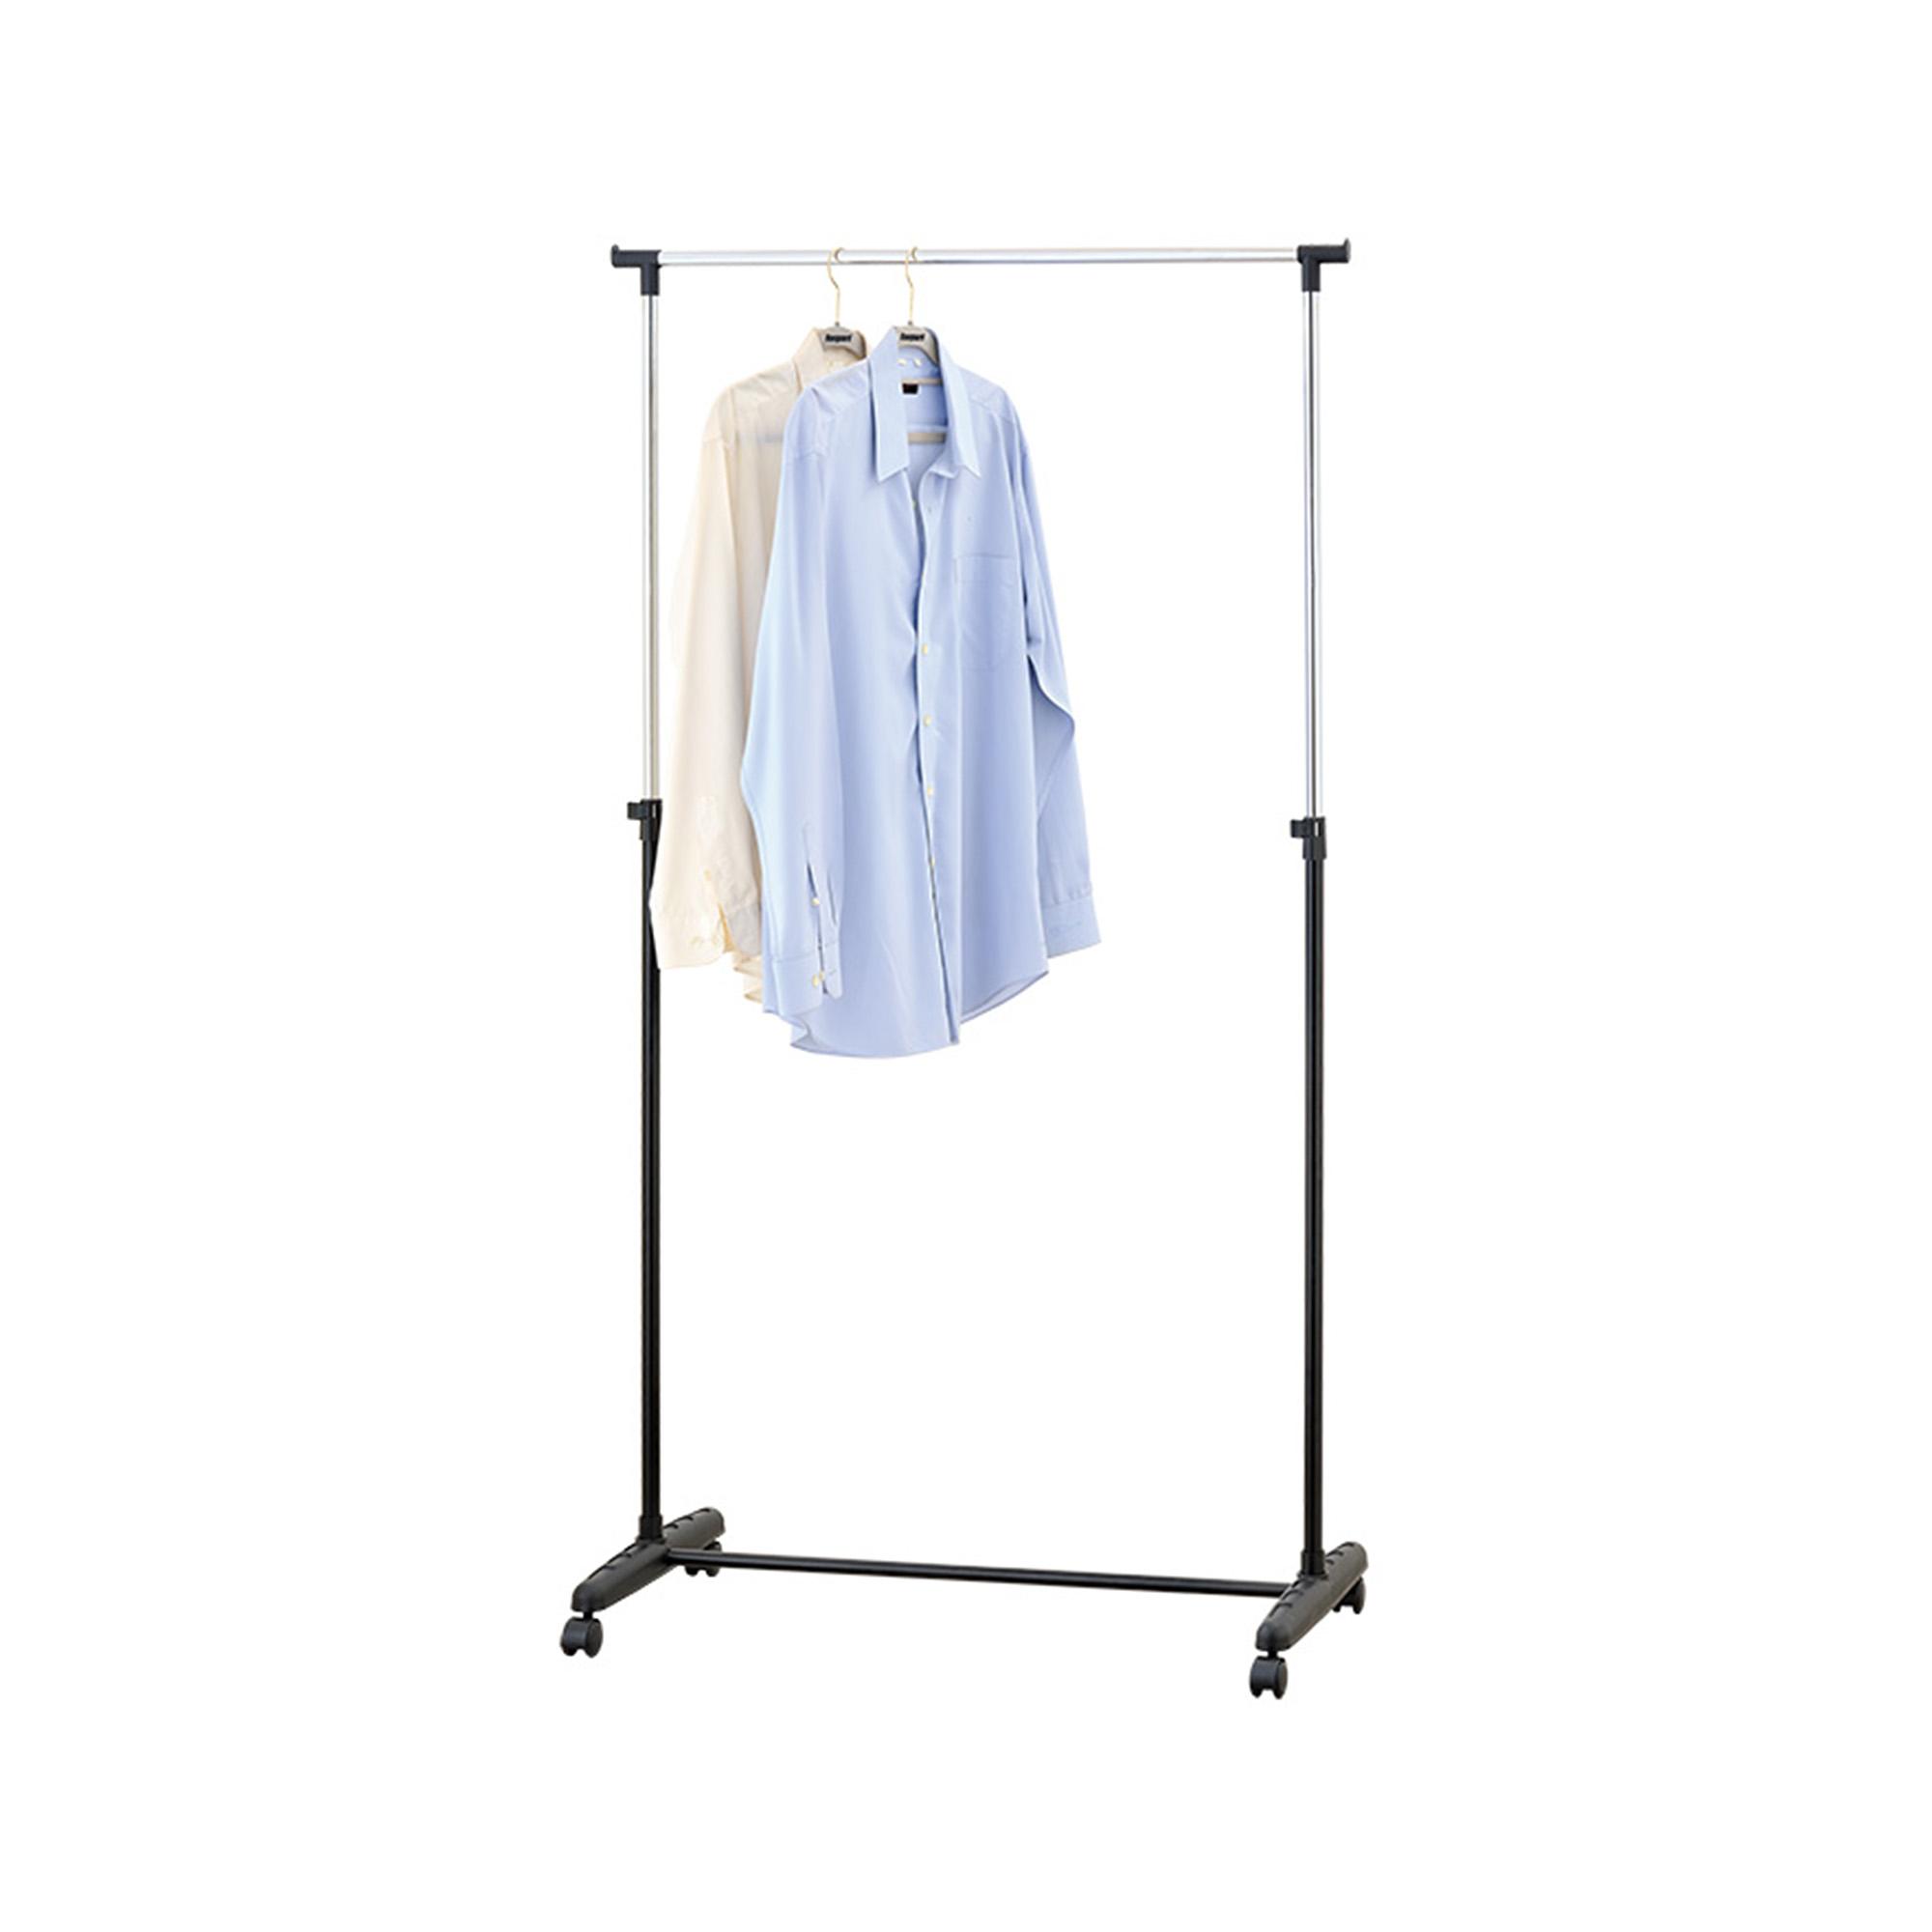 Mind Reader Adjustable Metal Garment Rack with Wheels, Silver/Black